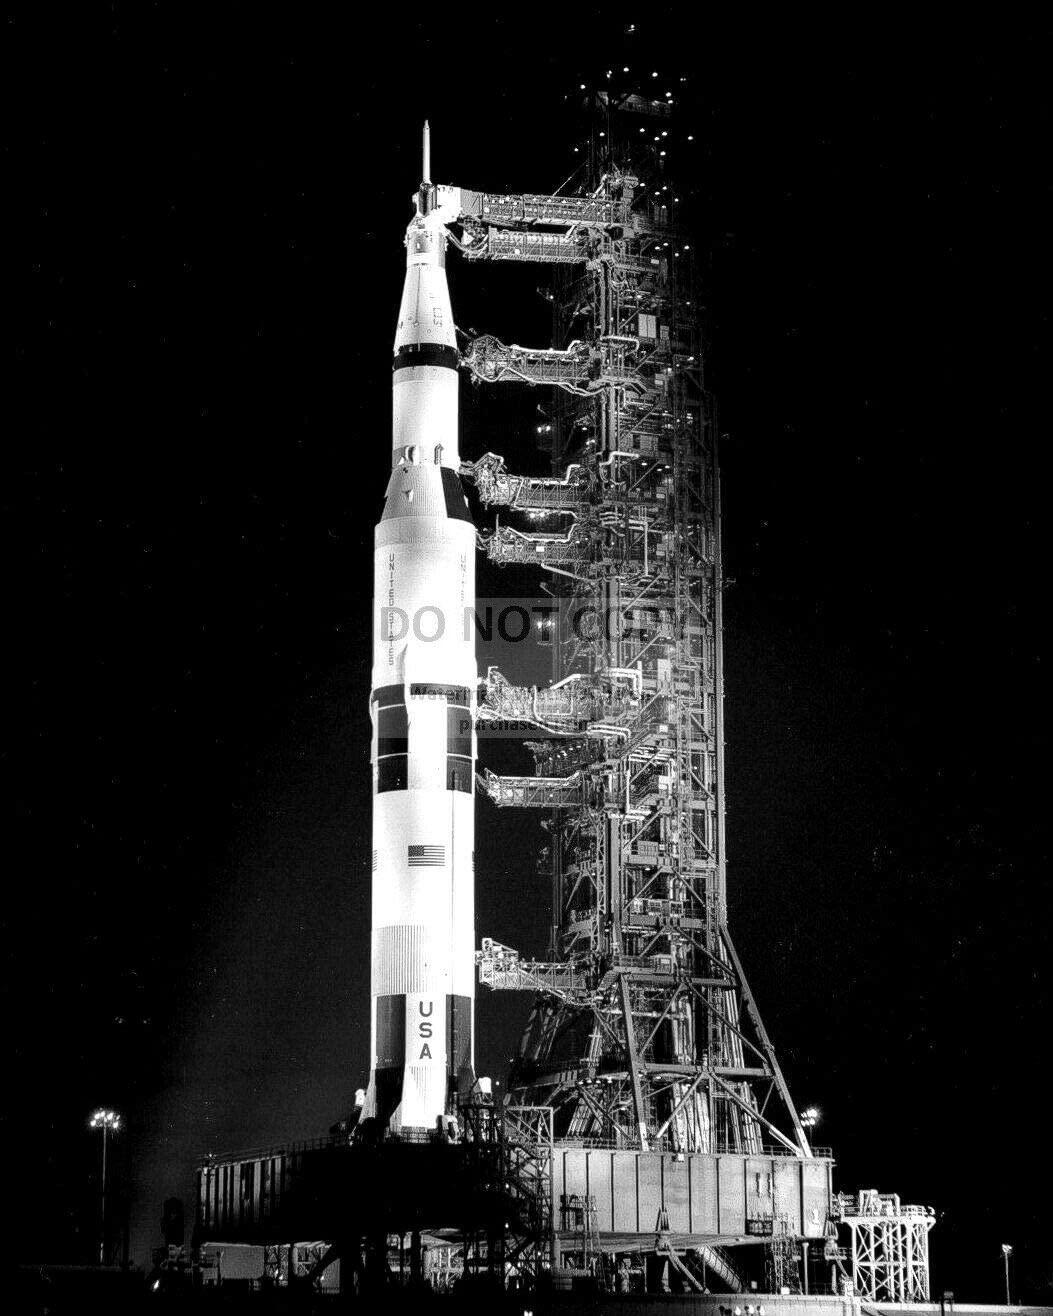 bucraft Saturn V 5 Rocket ON Launch PAD - 8X10 NASA Photo (BB-967)